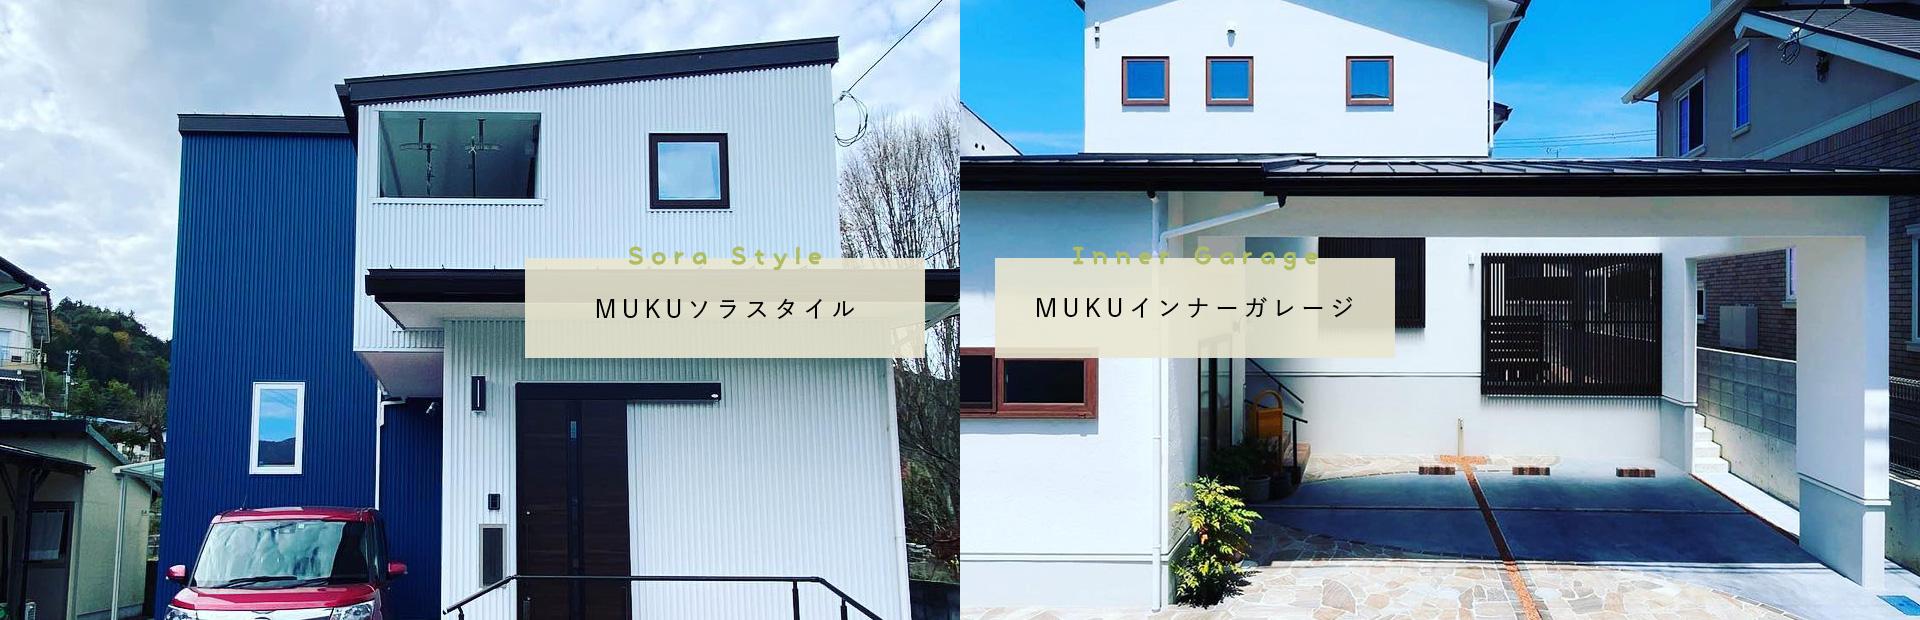 MUKU平屋スタイル